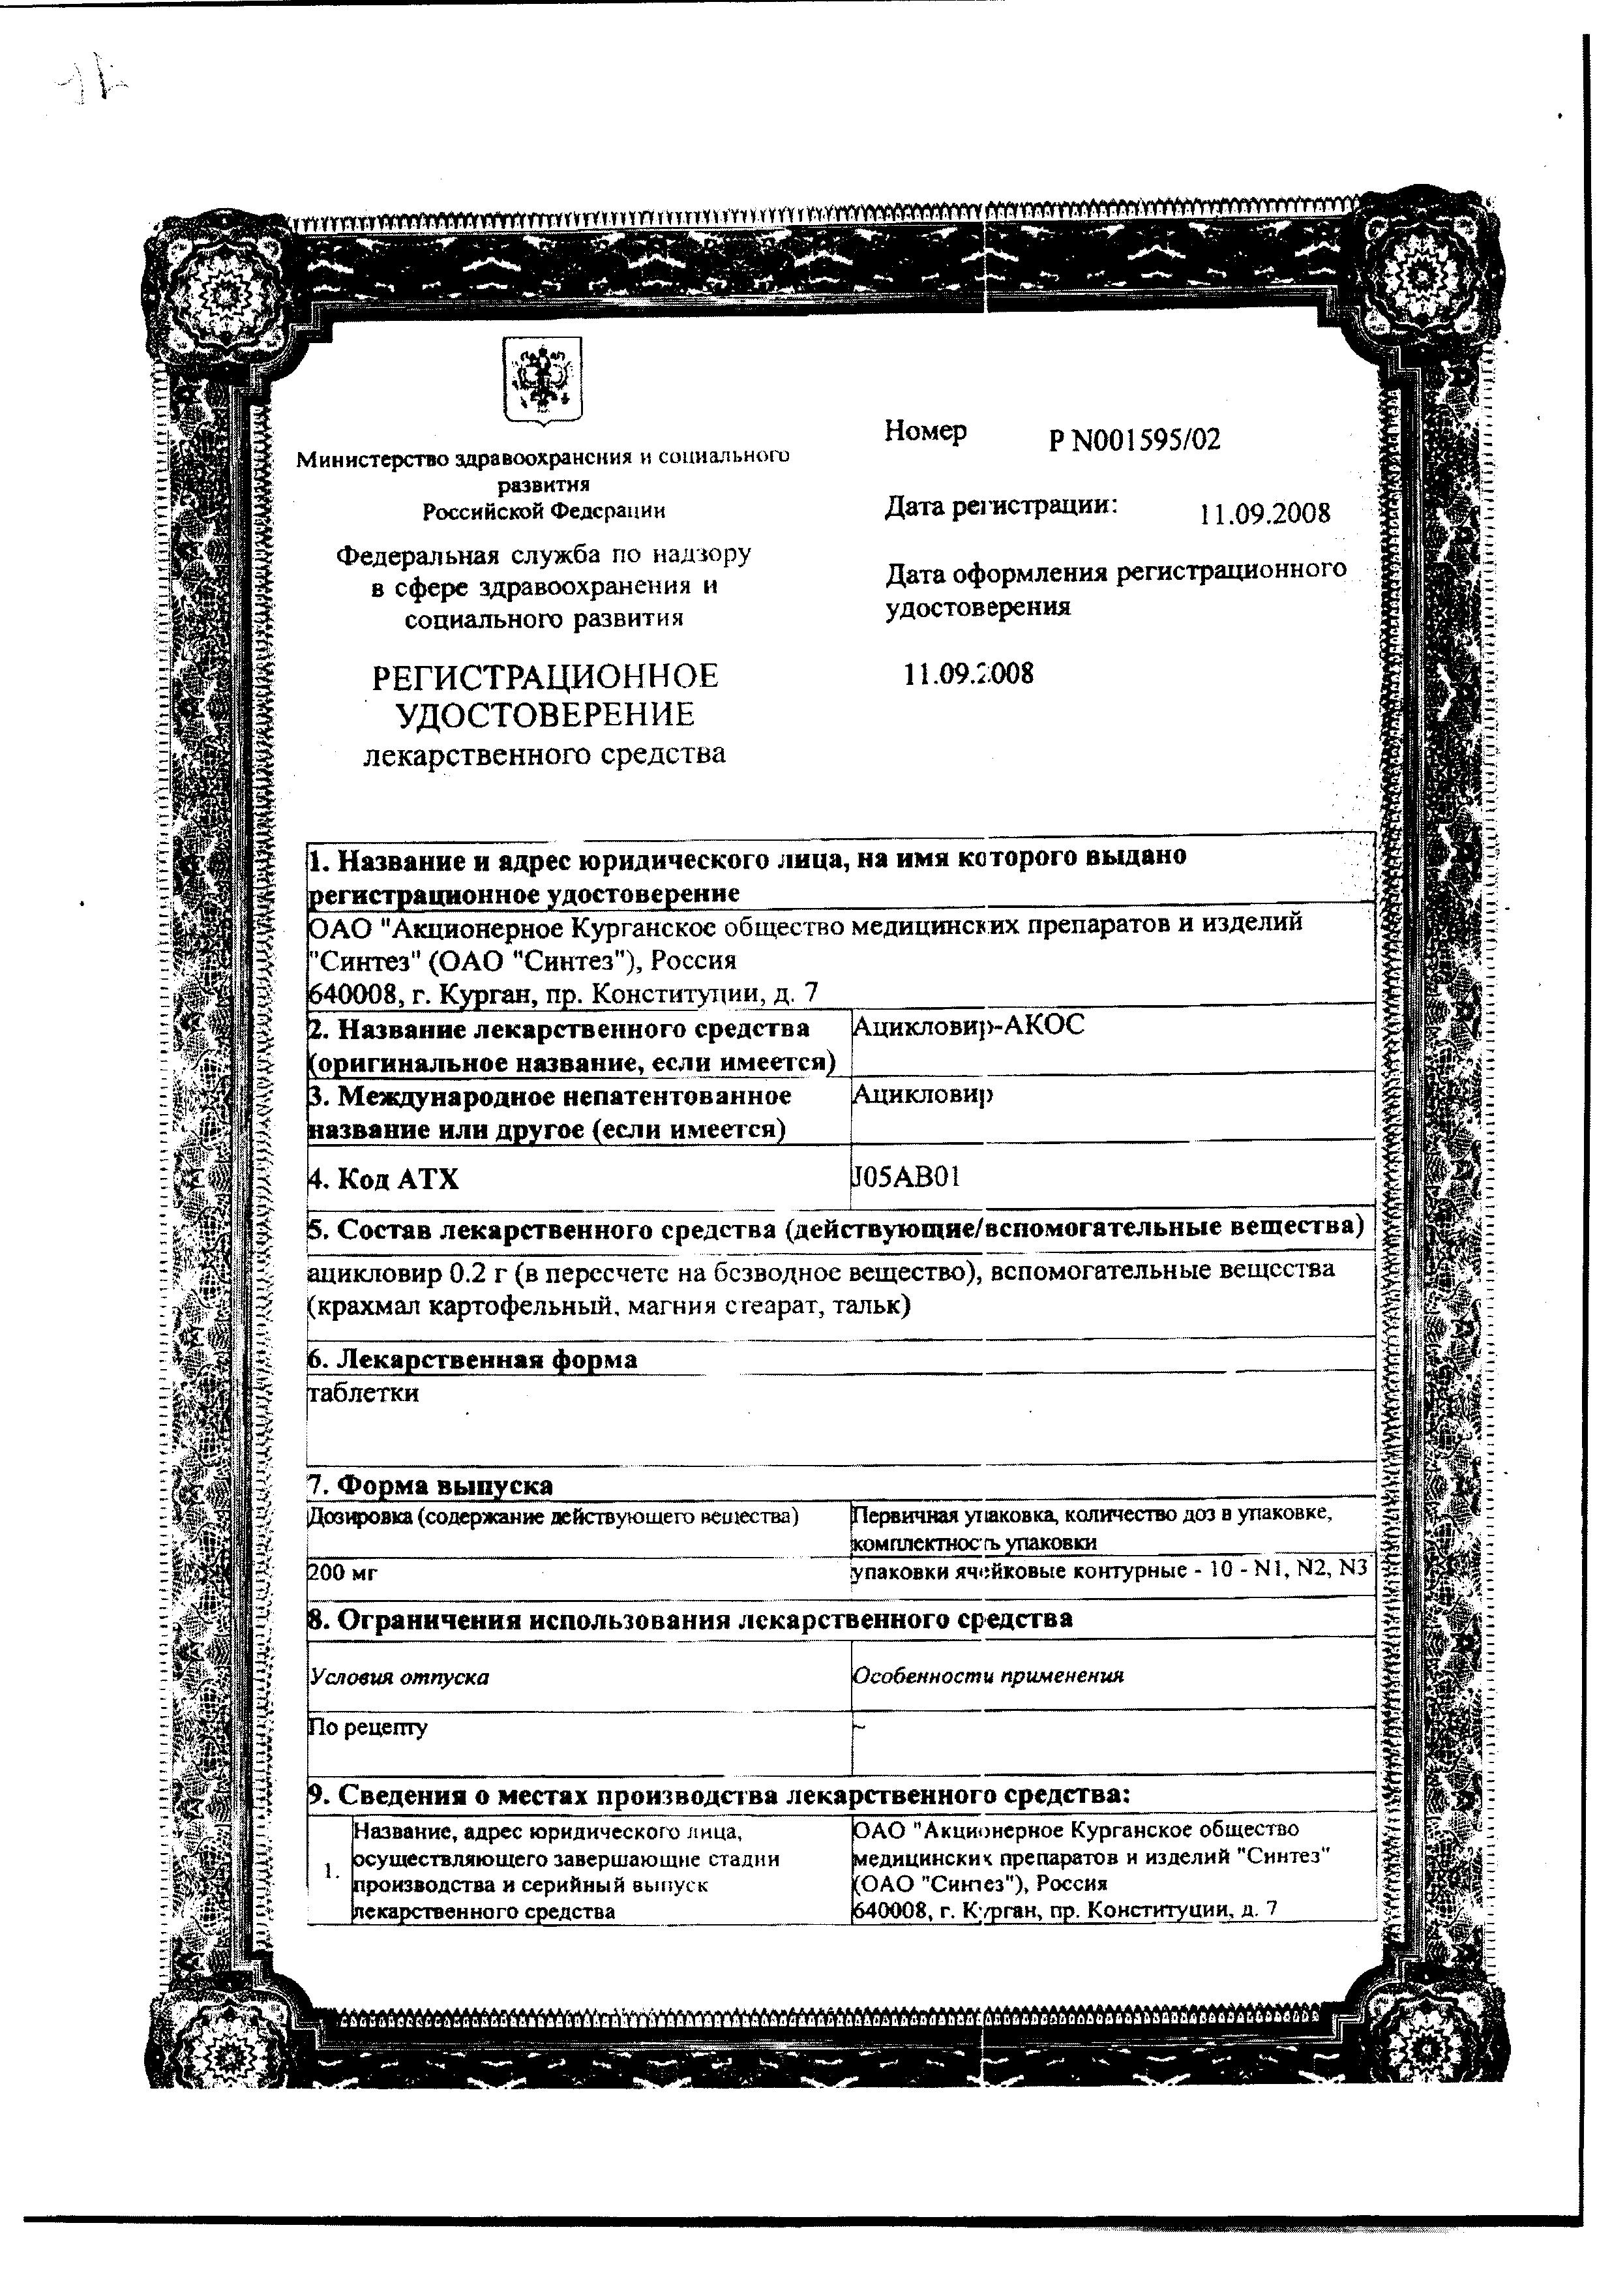 Ацикловир-АКОС сертификат